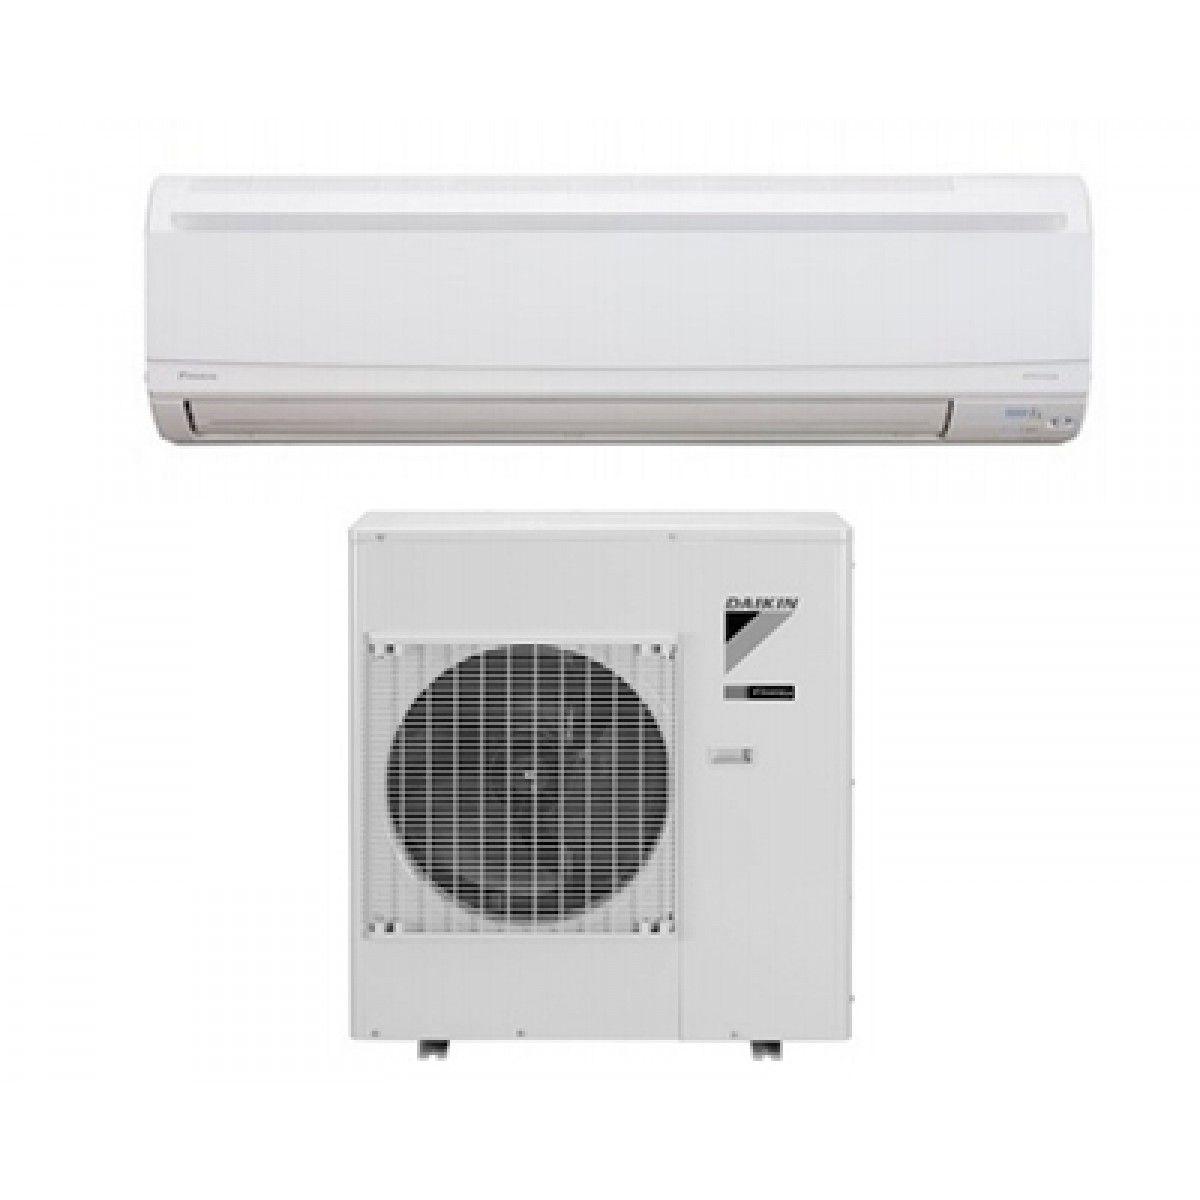 Daikin Skyair 24k Btu 17 6 Seer Cooling Only System With